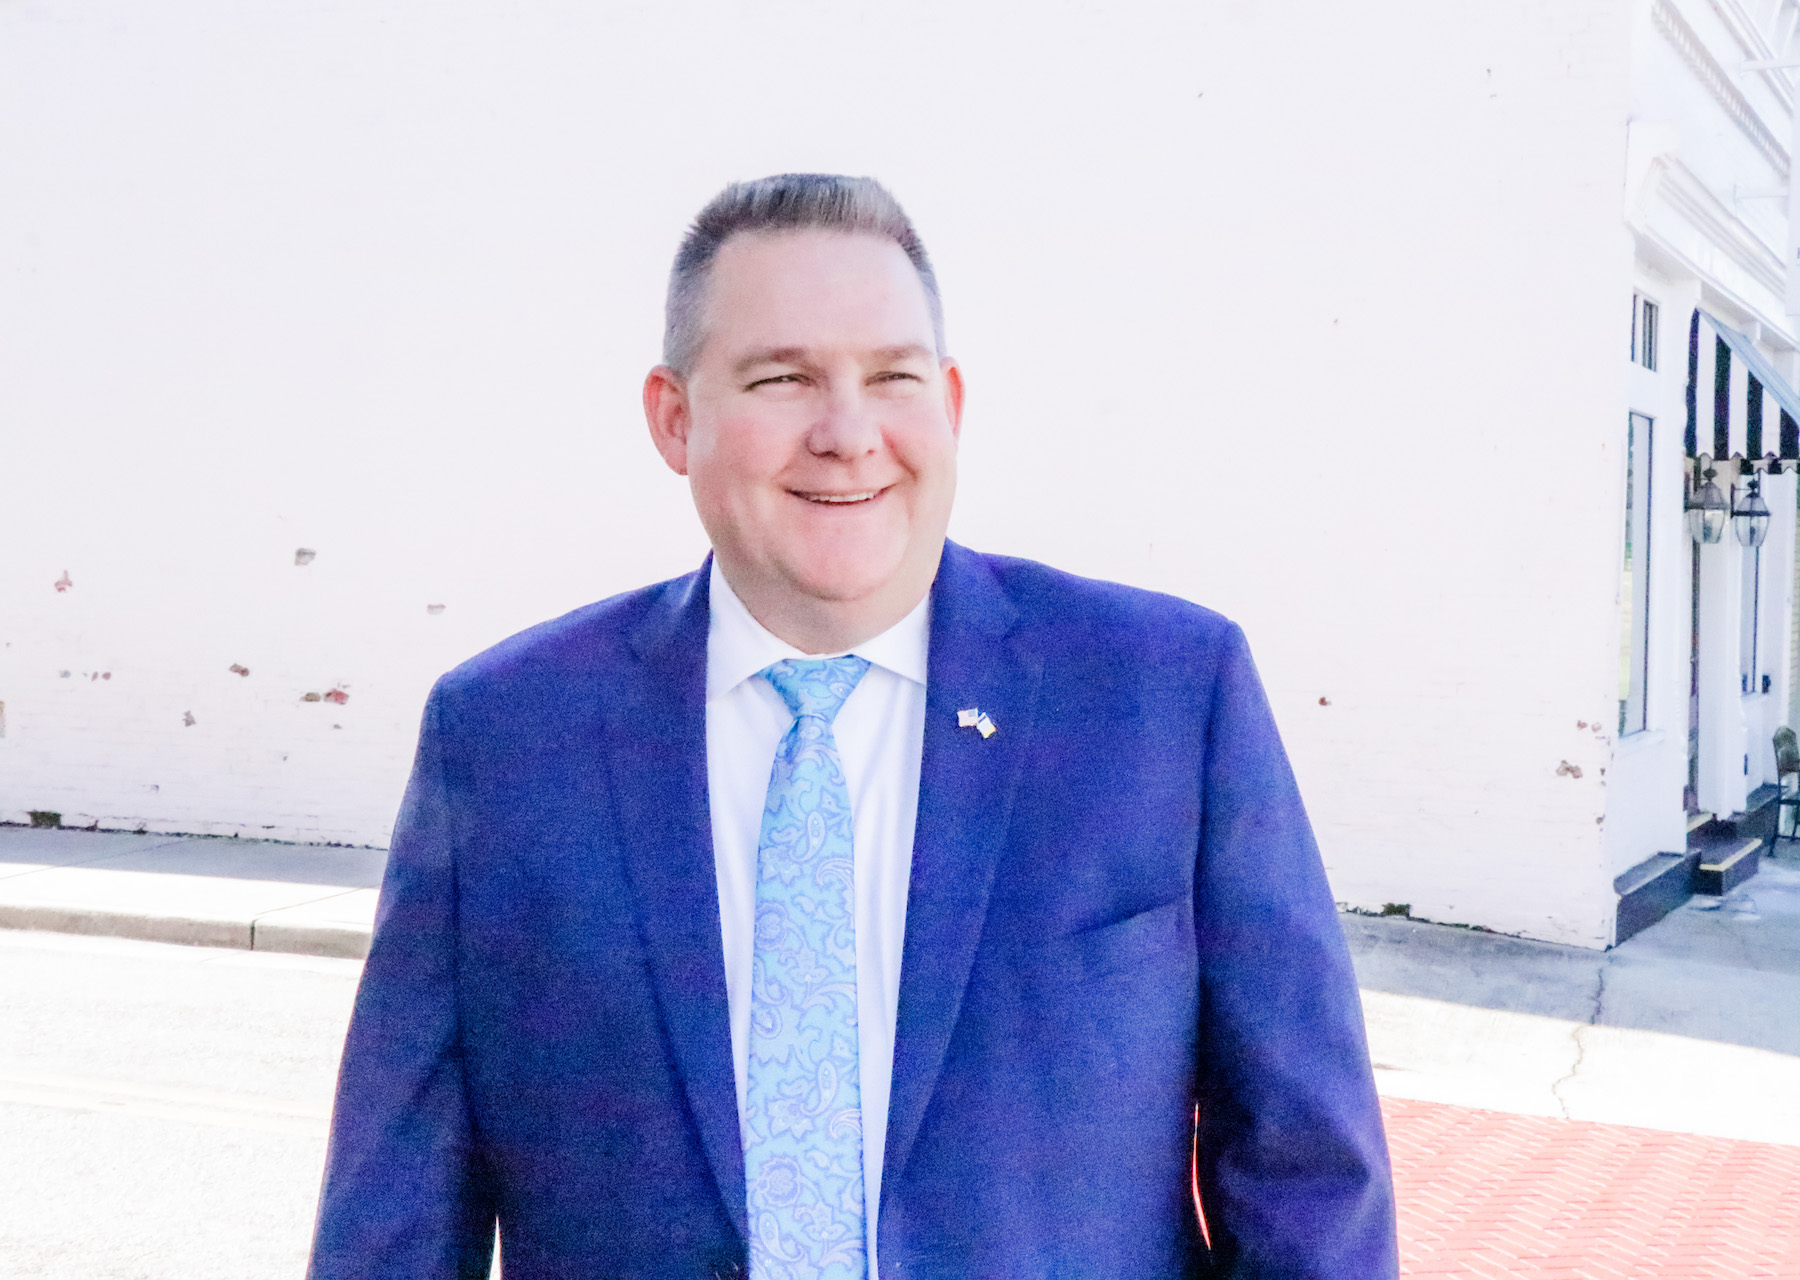 FMEP Board Patrick White edited